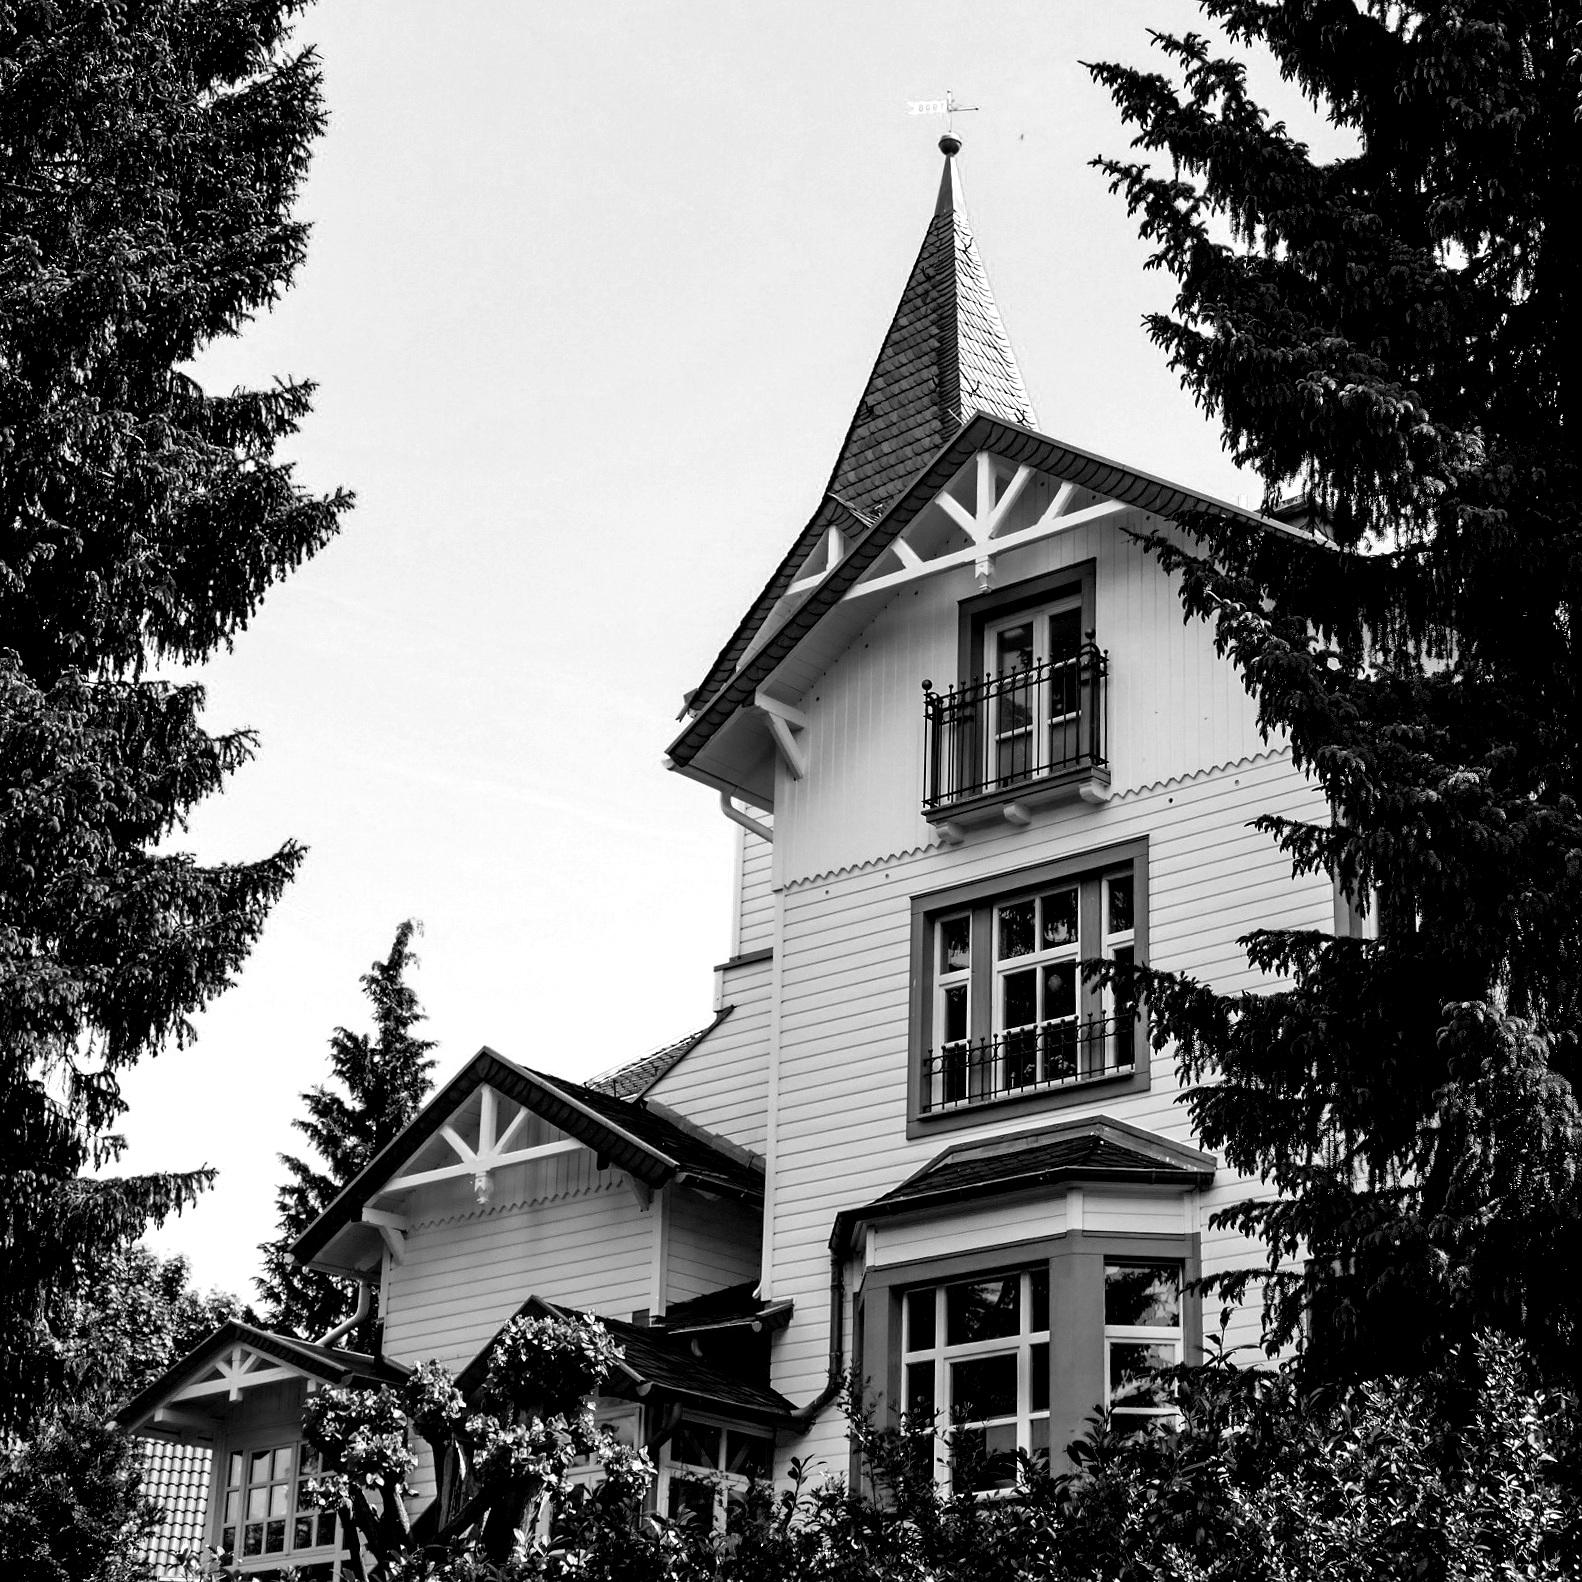 Country home / Taunus 2014 -